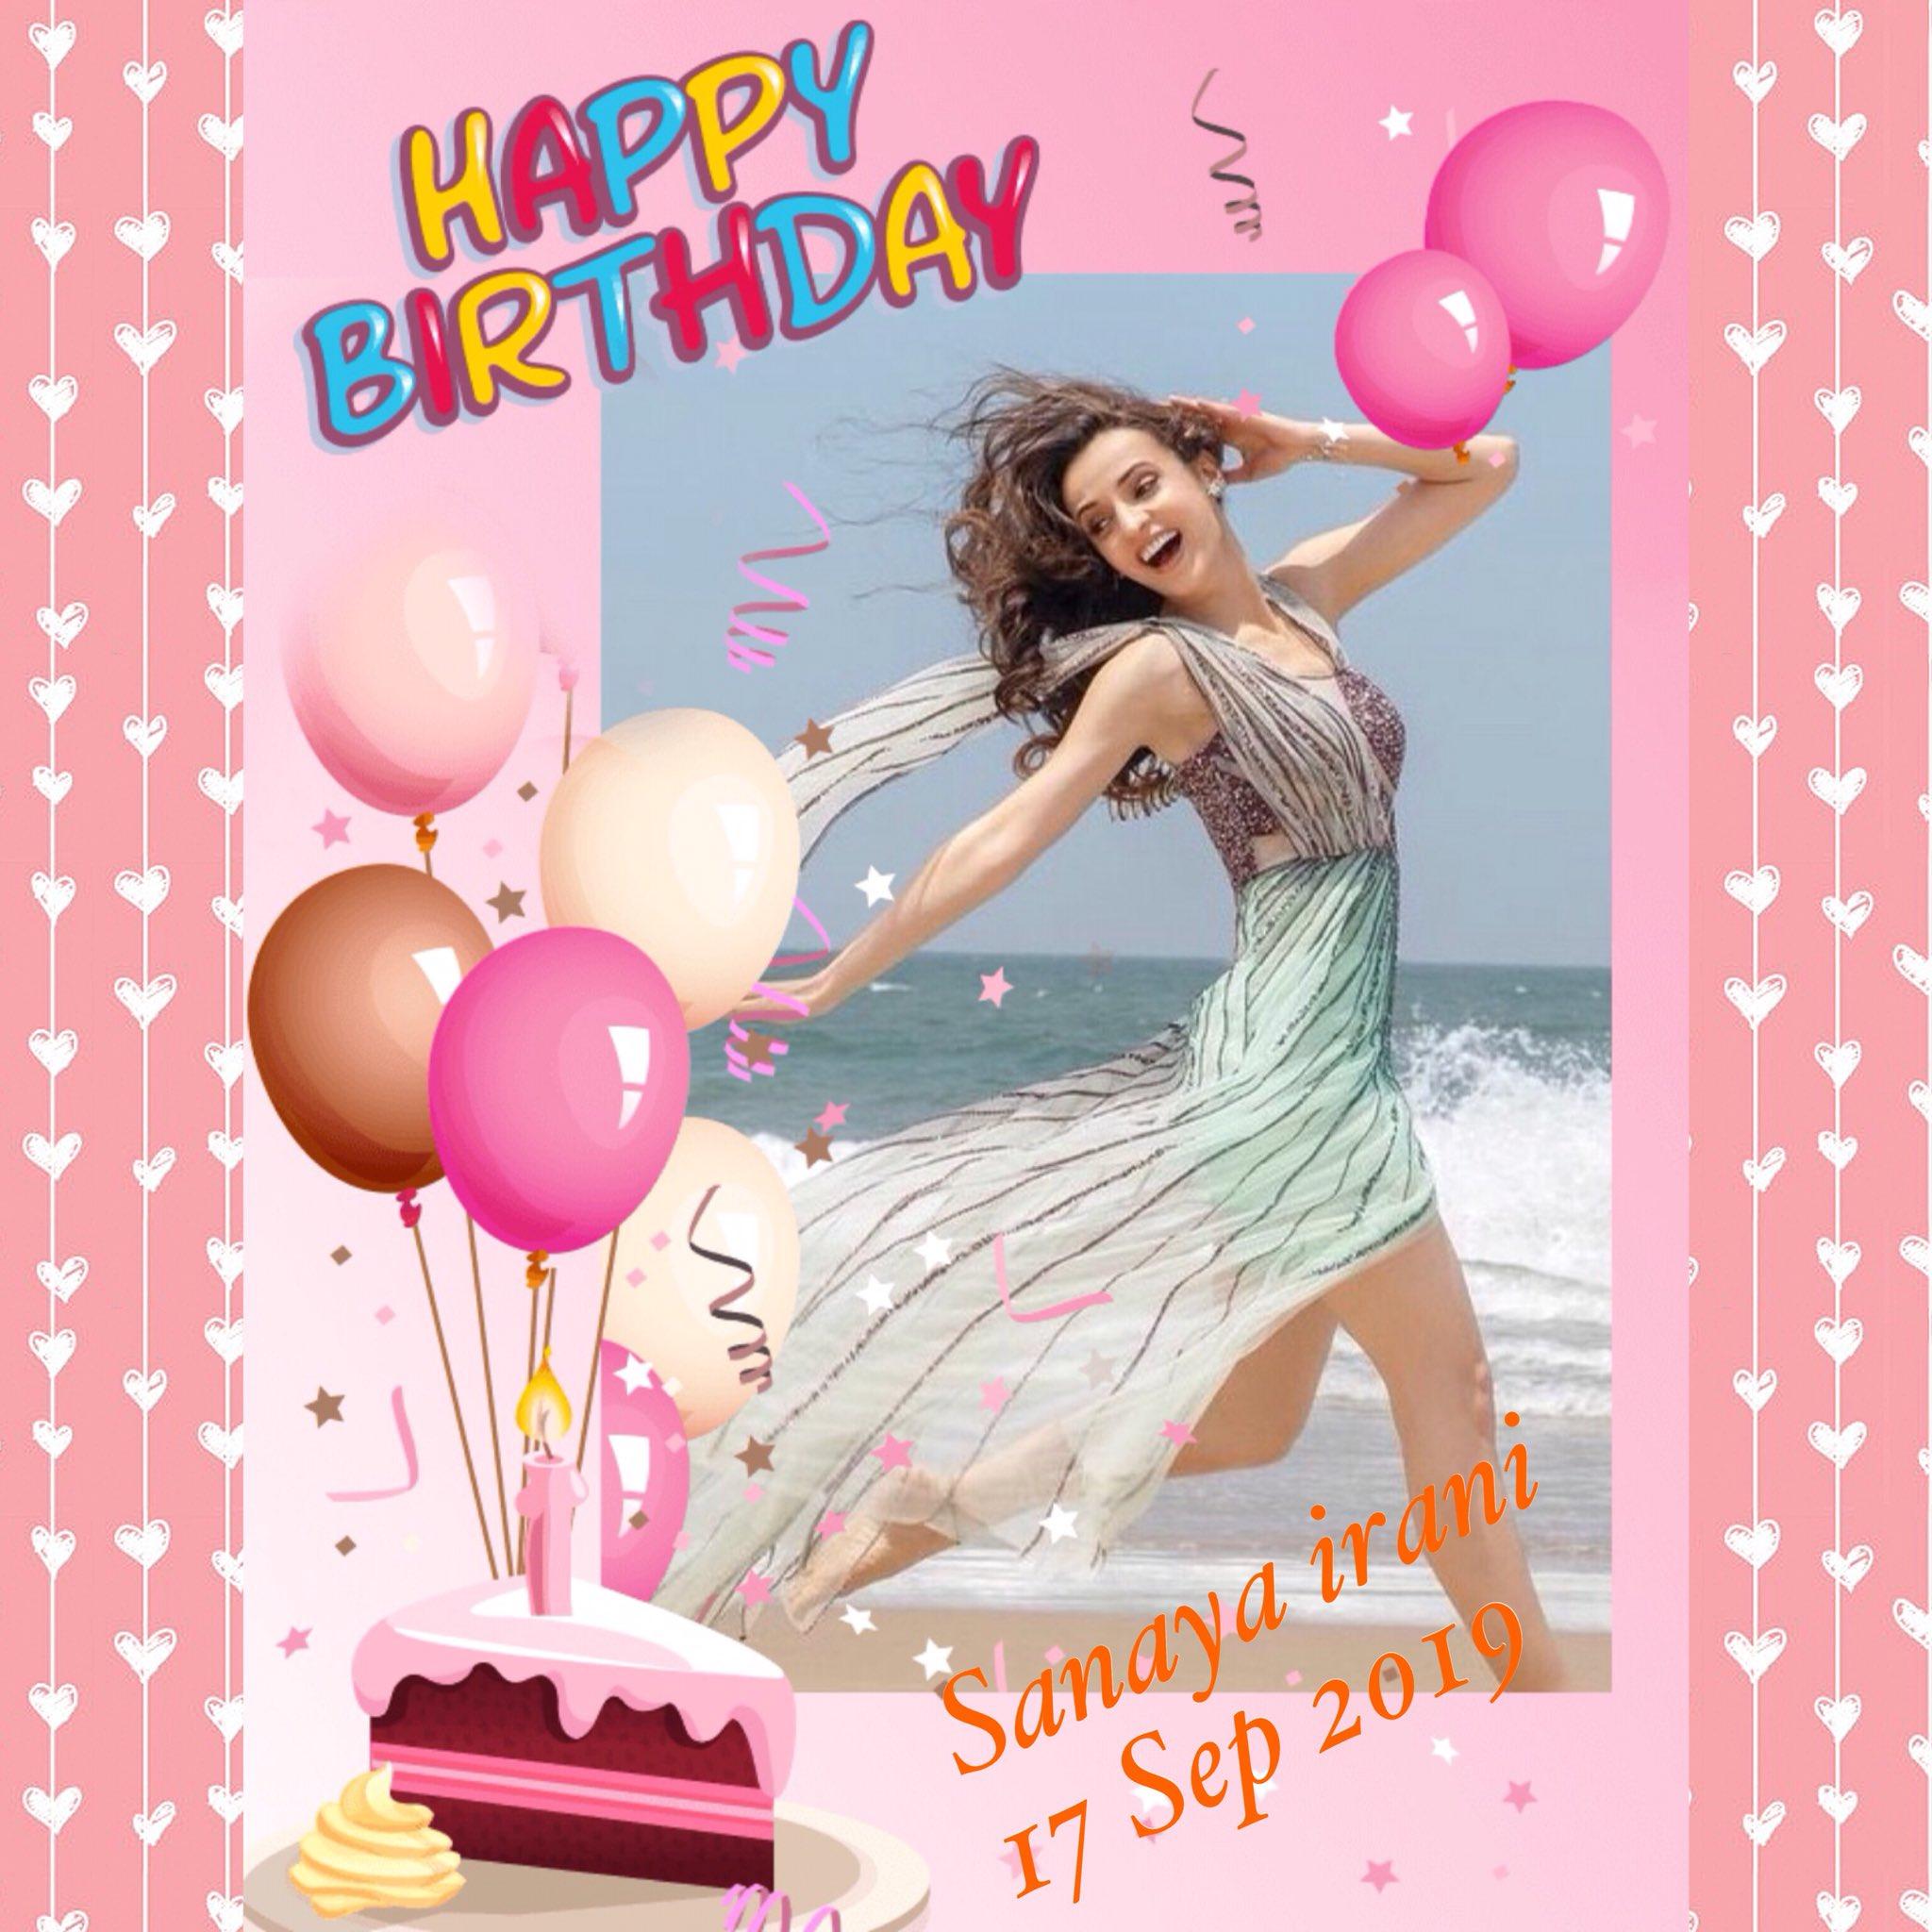 "\""Wishing you a very happy birthday And may this day be joyful forever\""    Sanaya irani 17 September 2019"